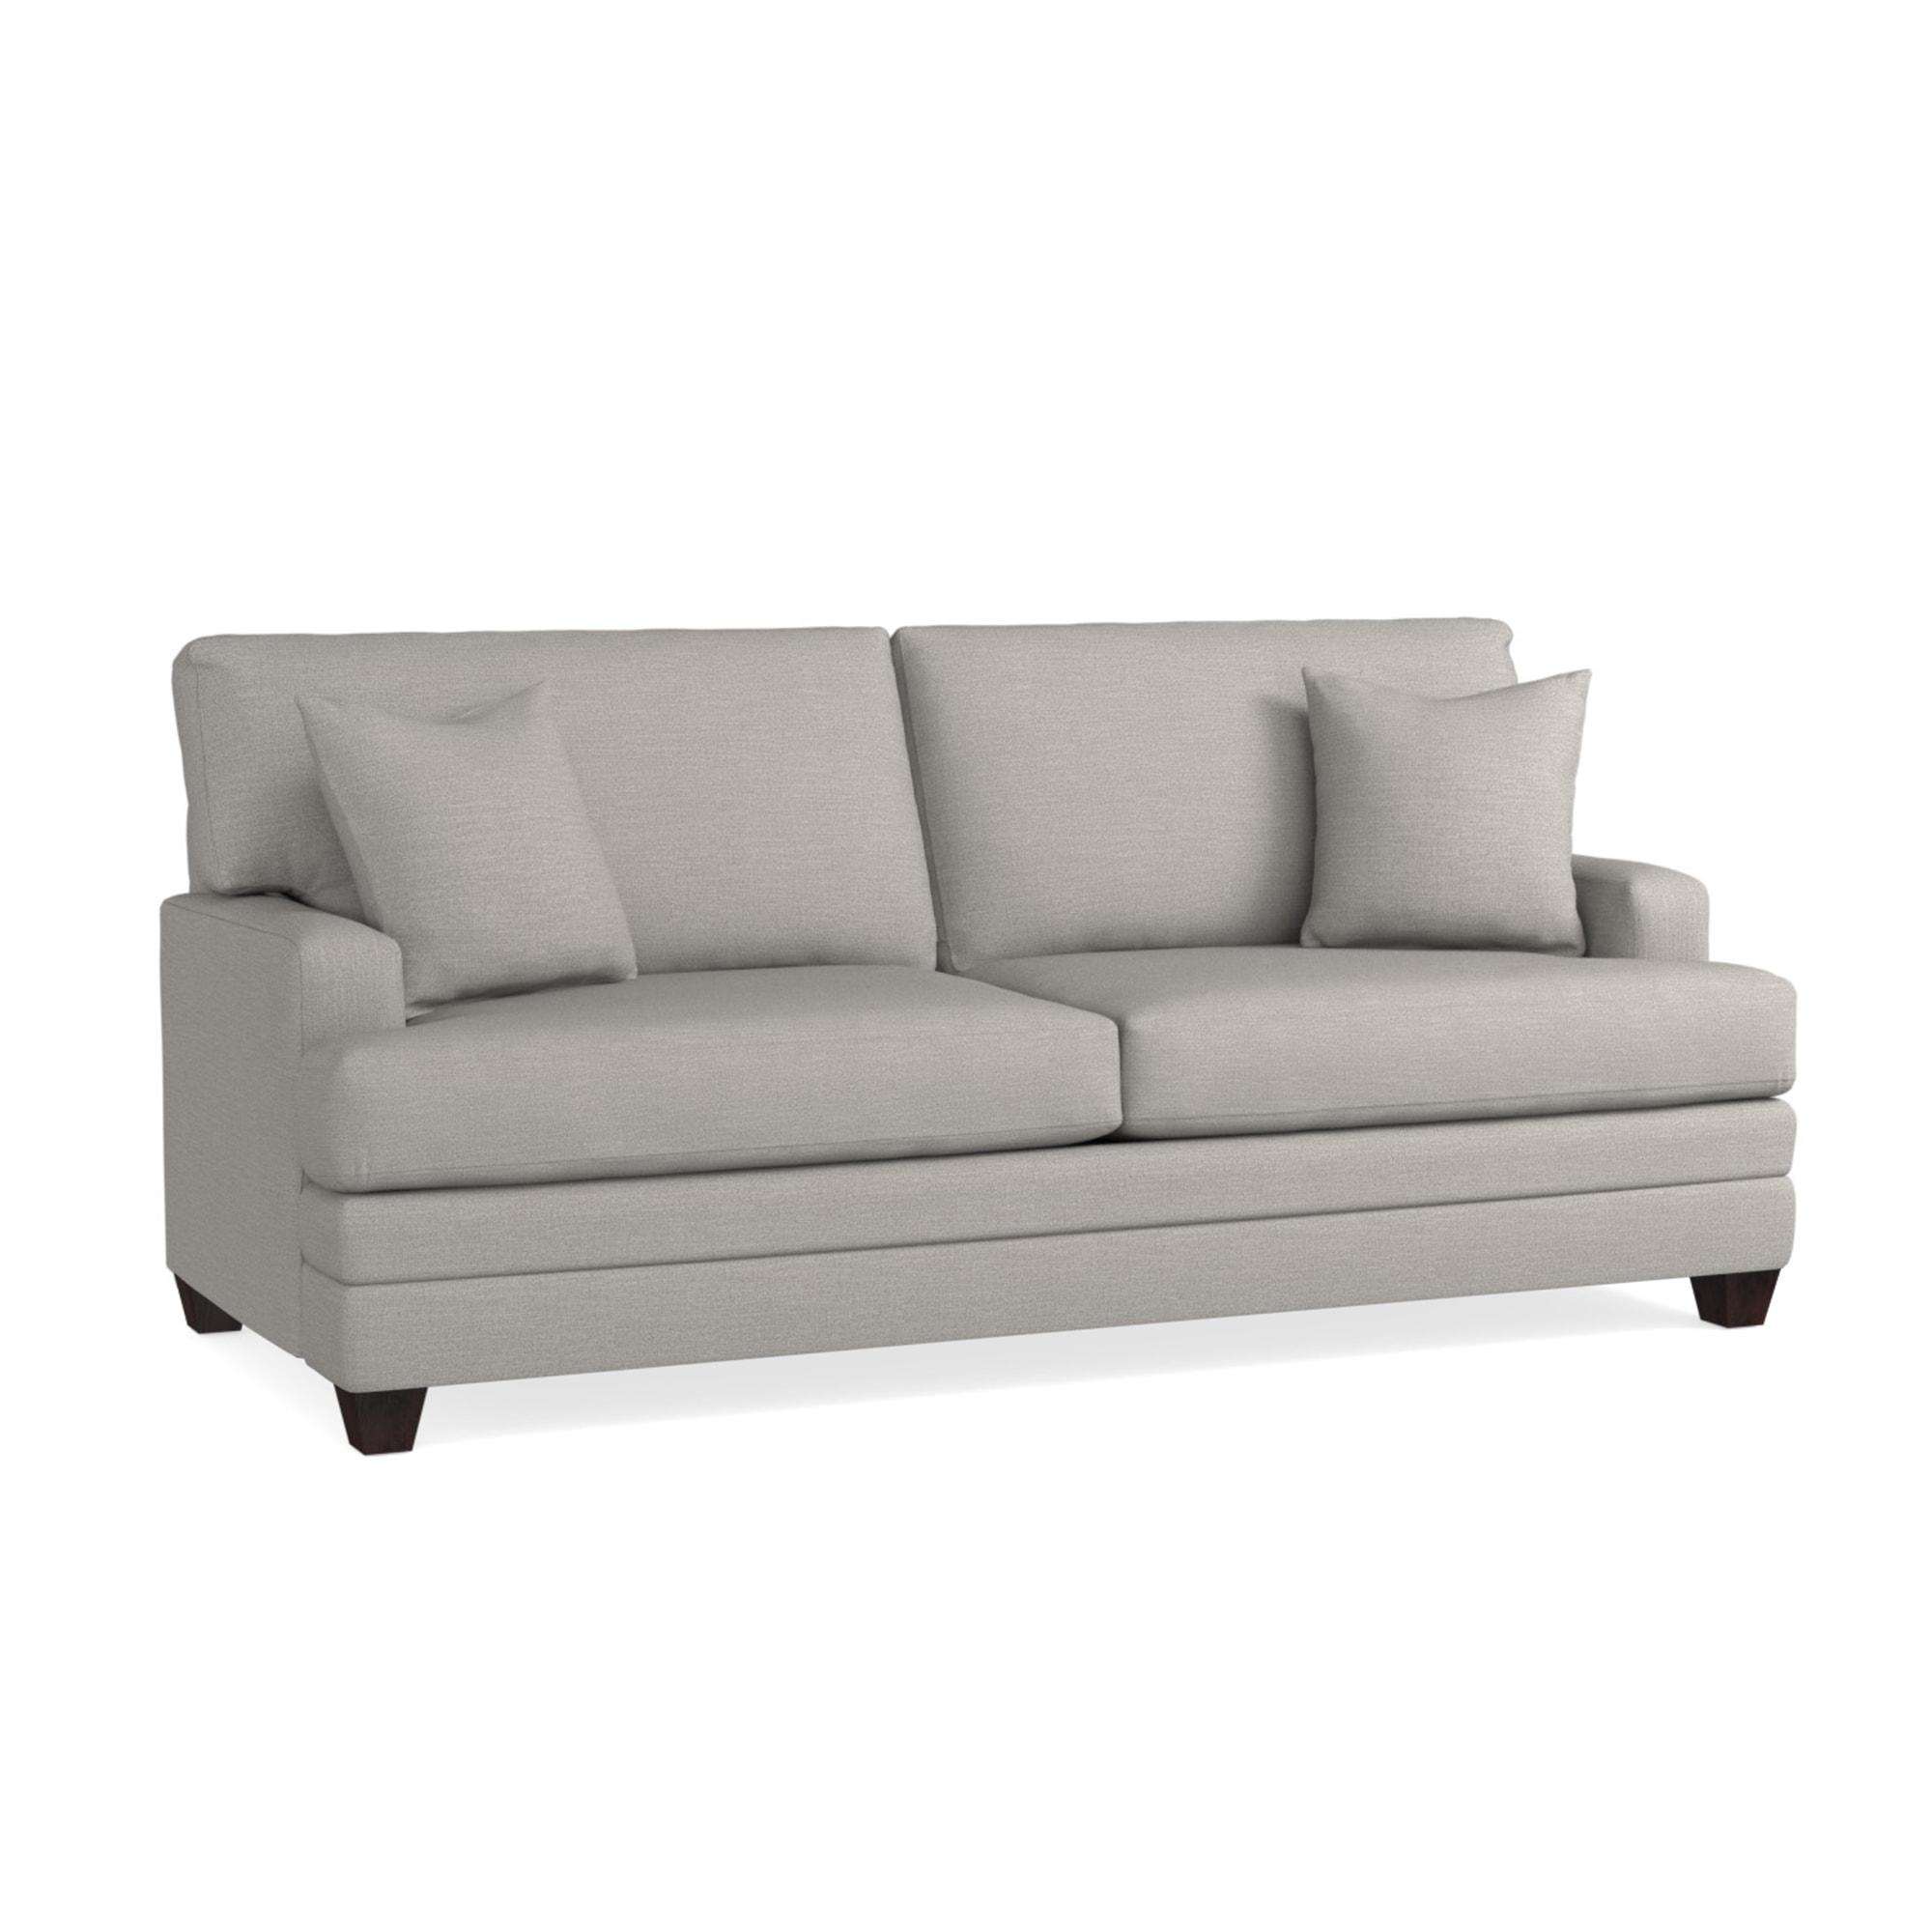 - Khaki Fabric Sleeper Sofa